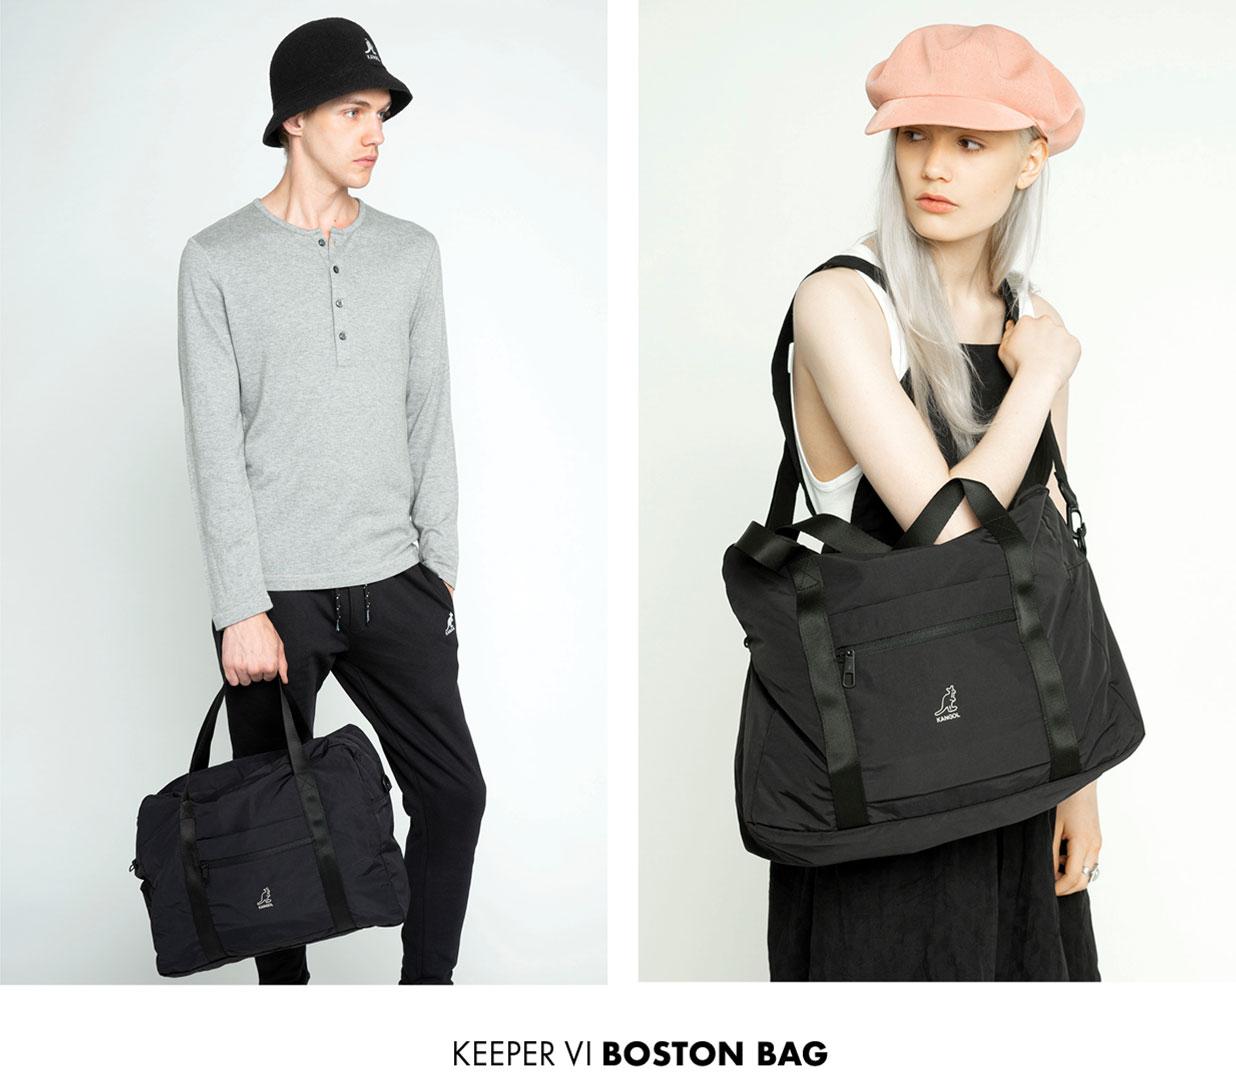 The Keeper VI Boston Bag